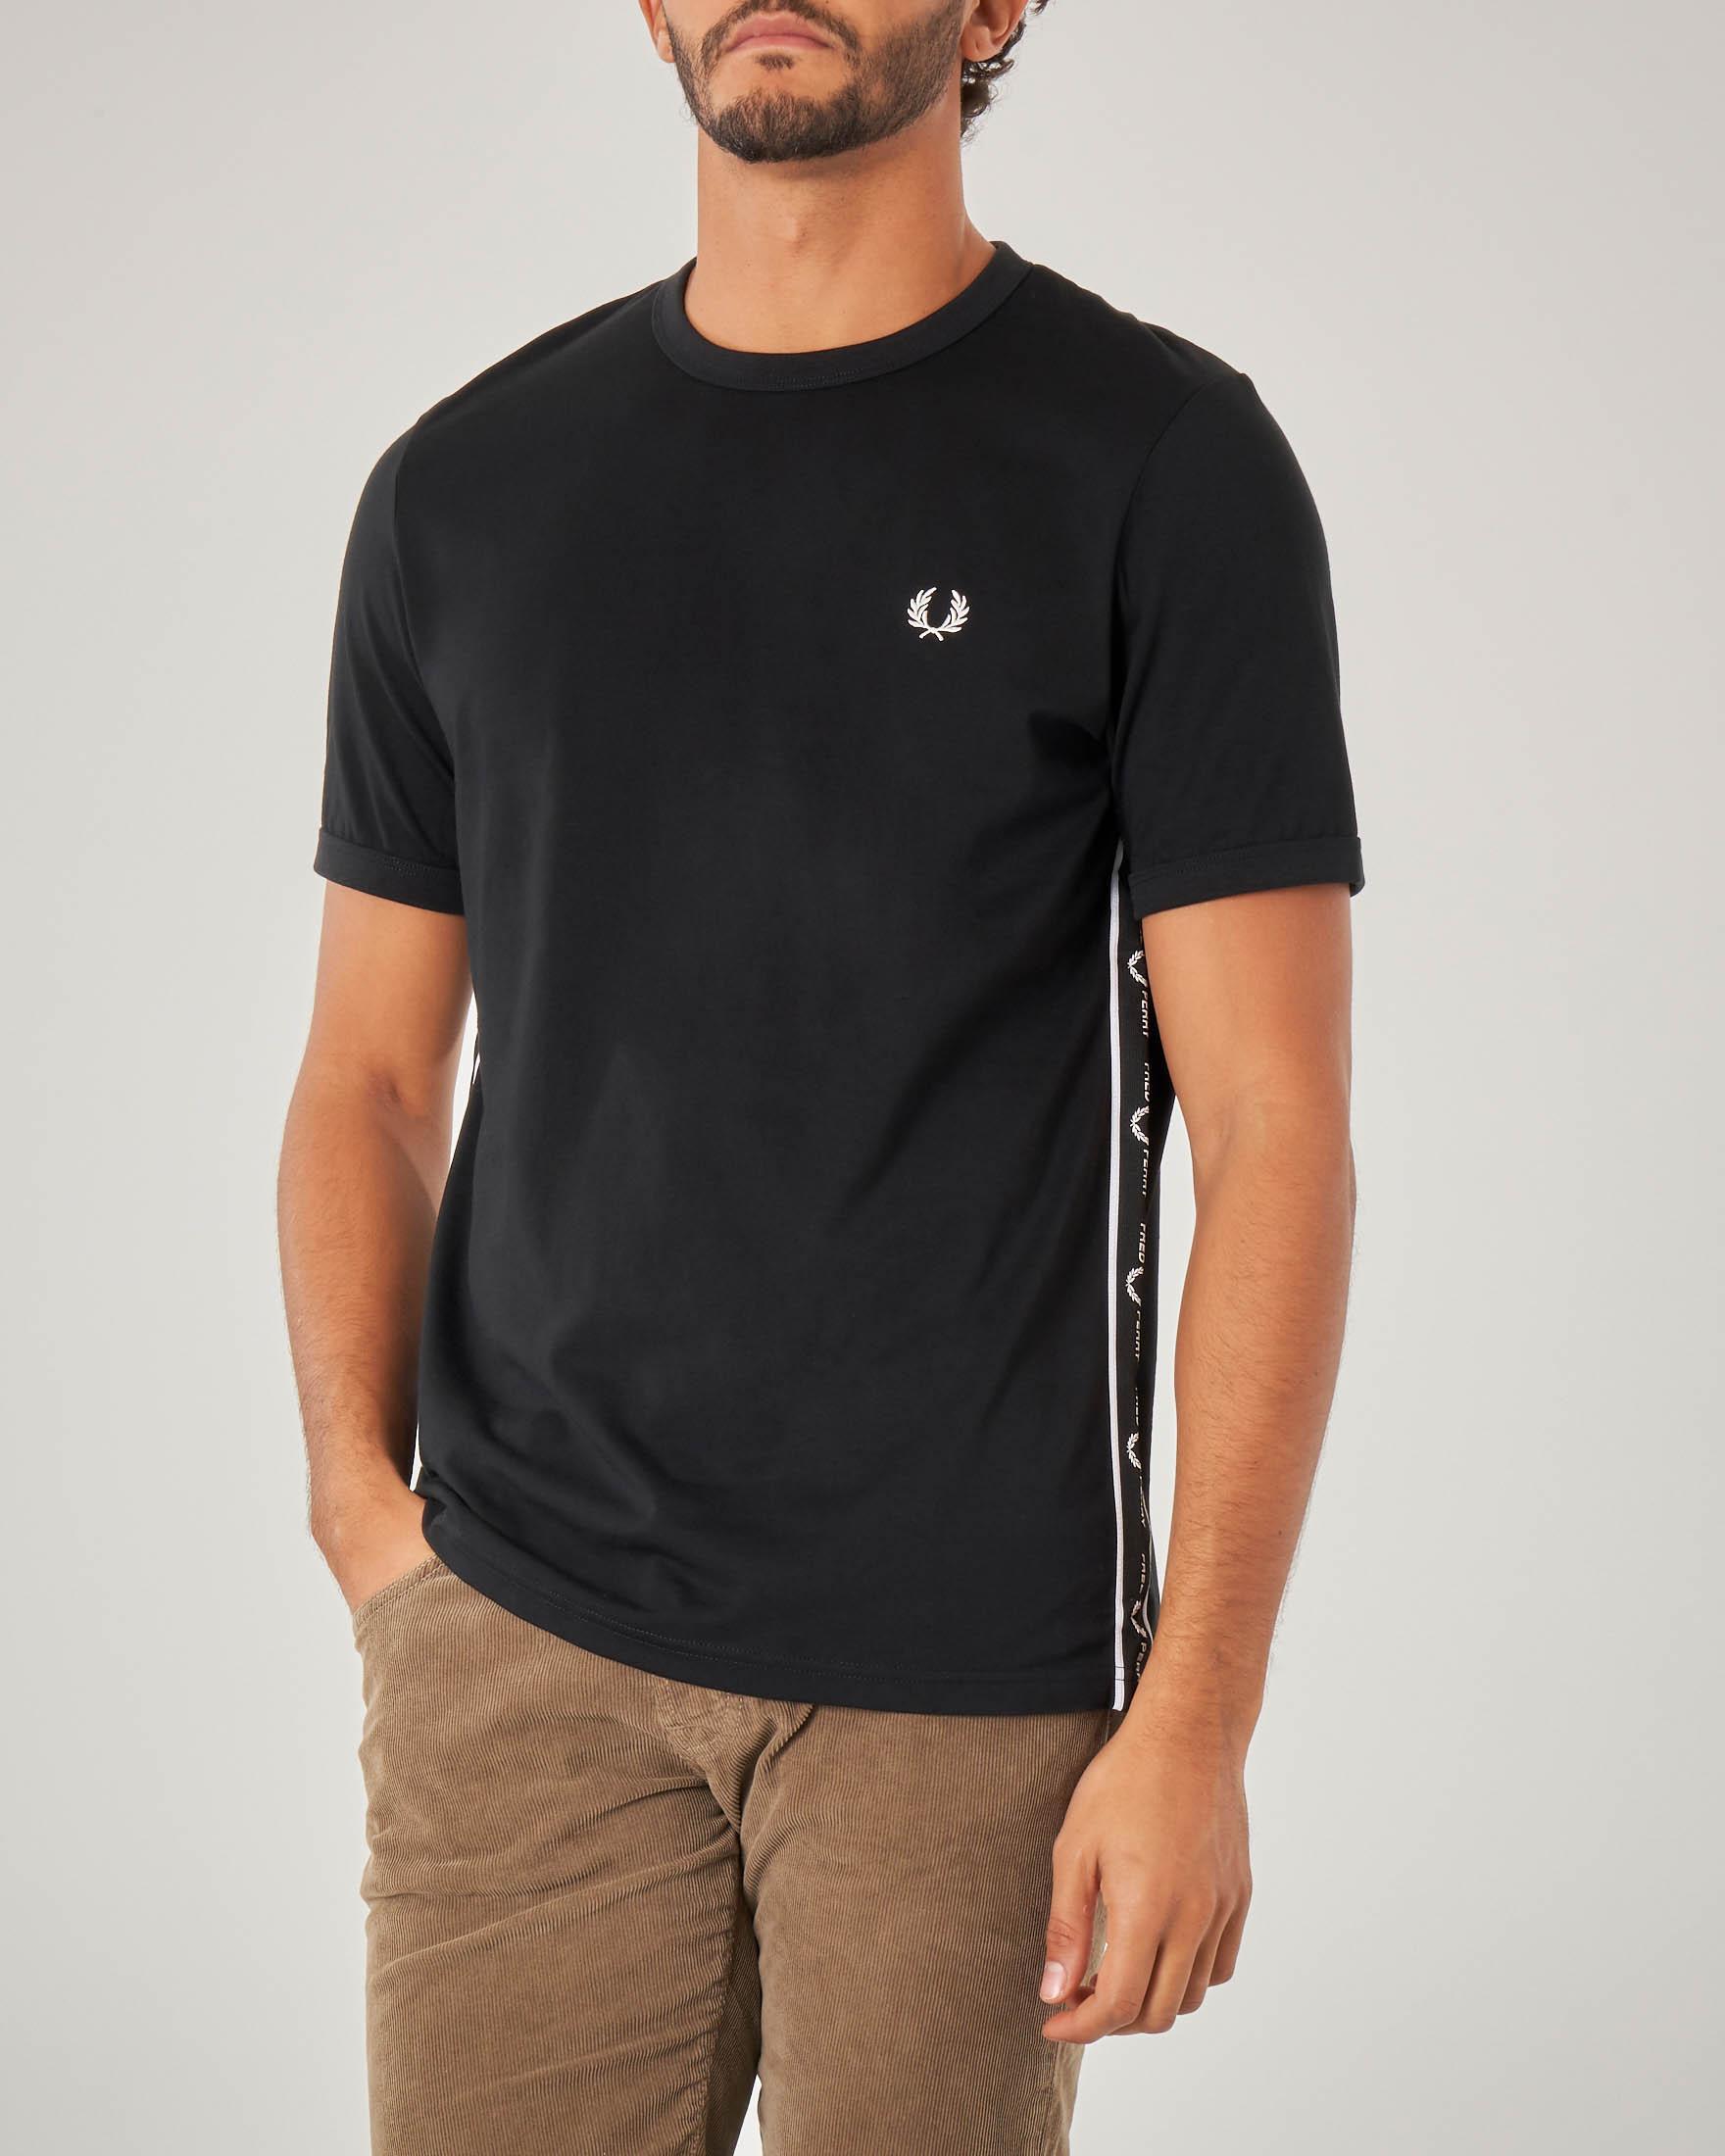 T-shirt nera mezza manica con banda logata